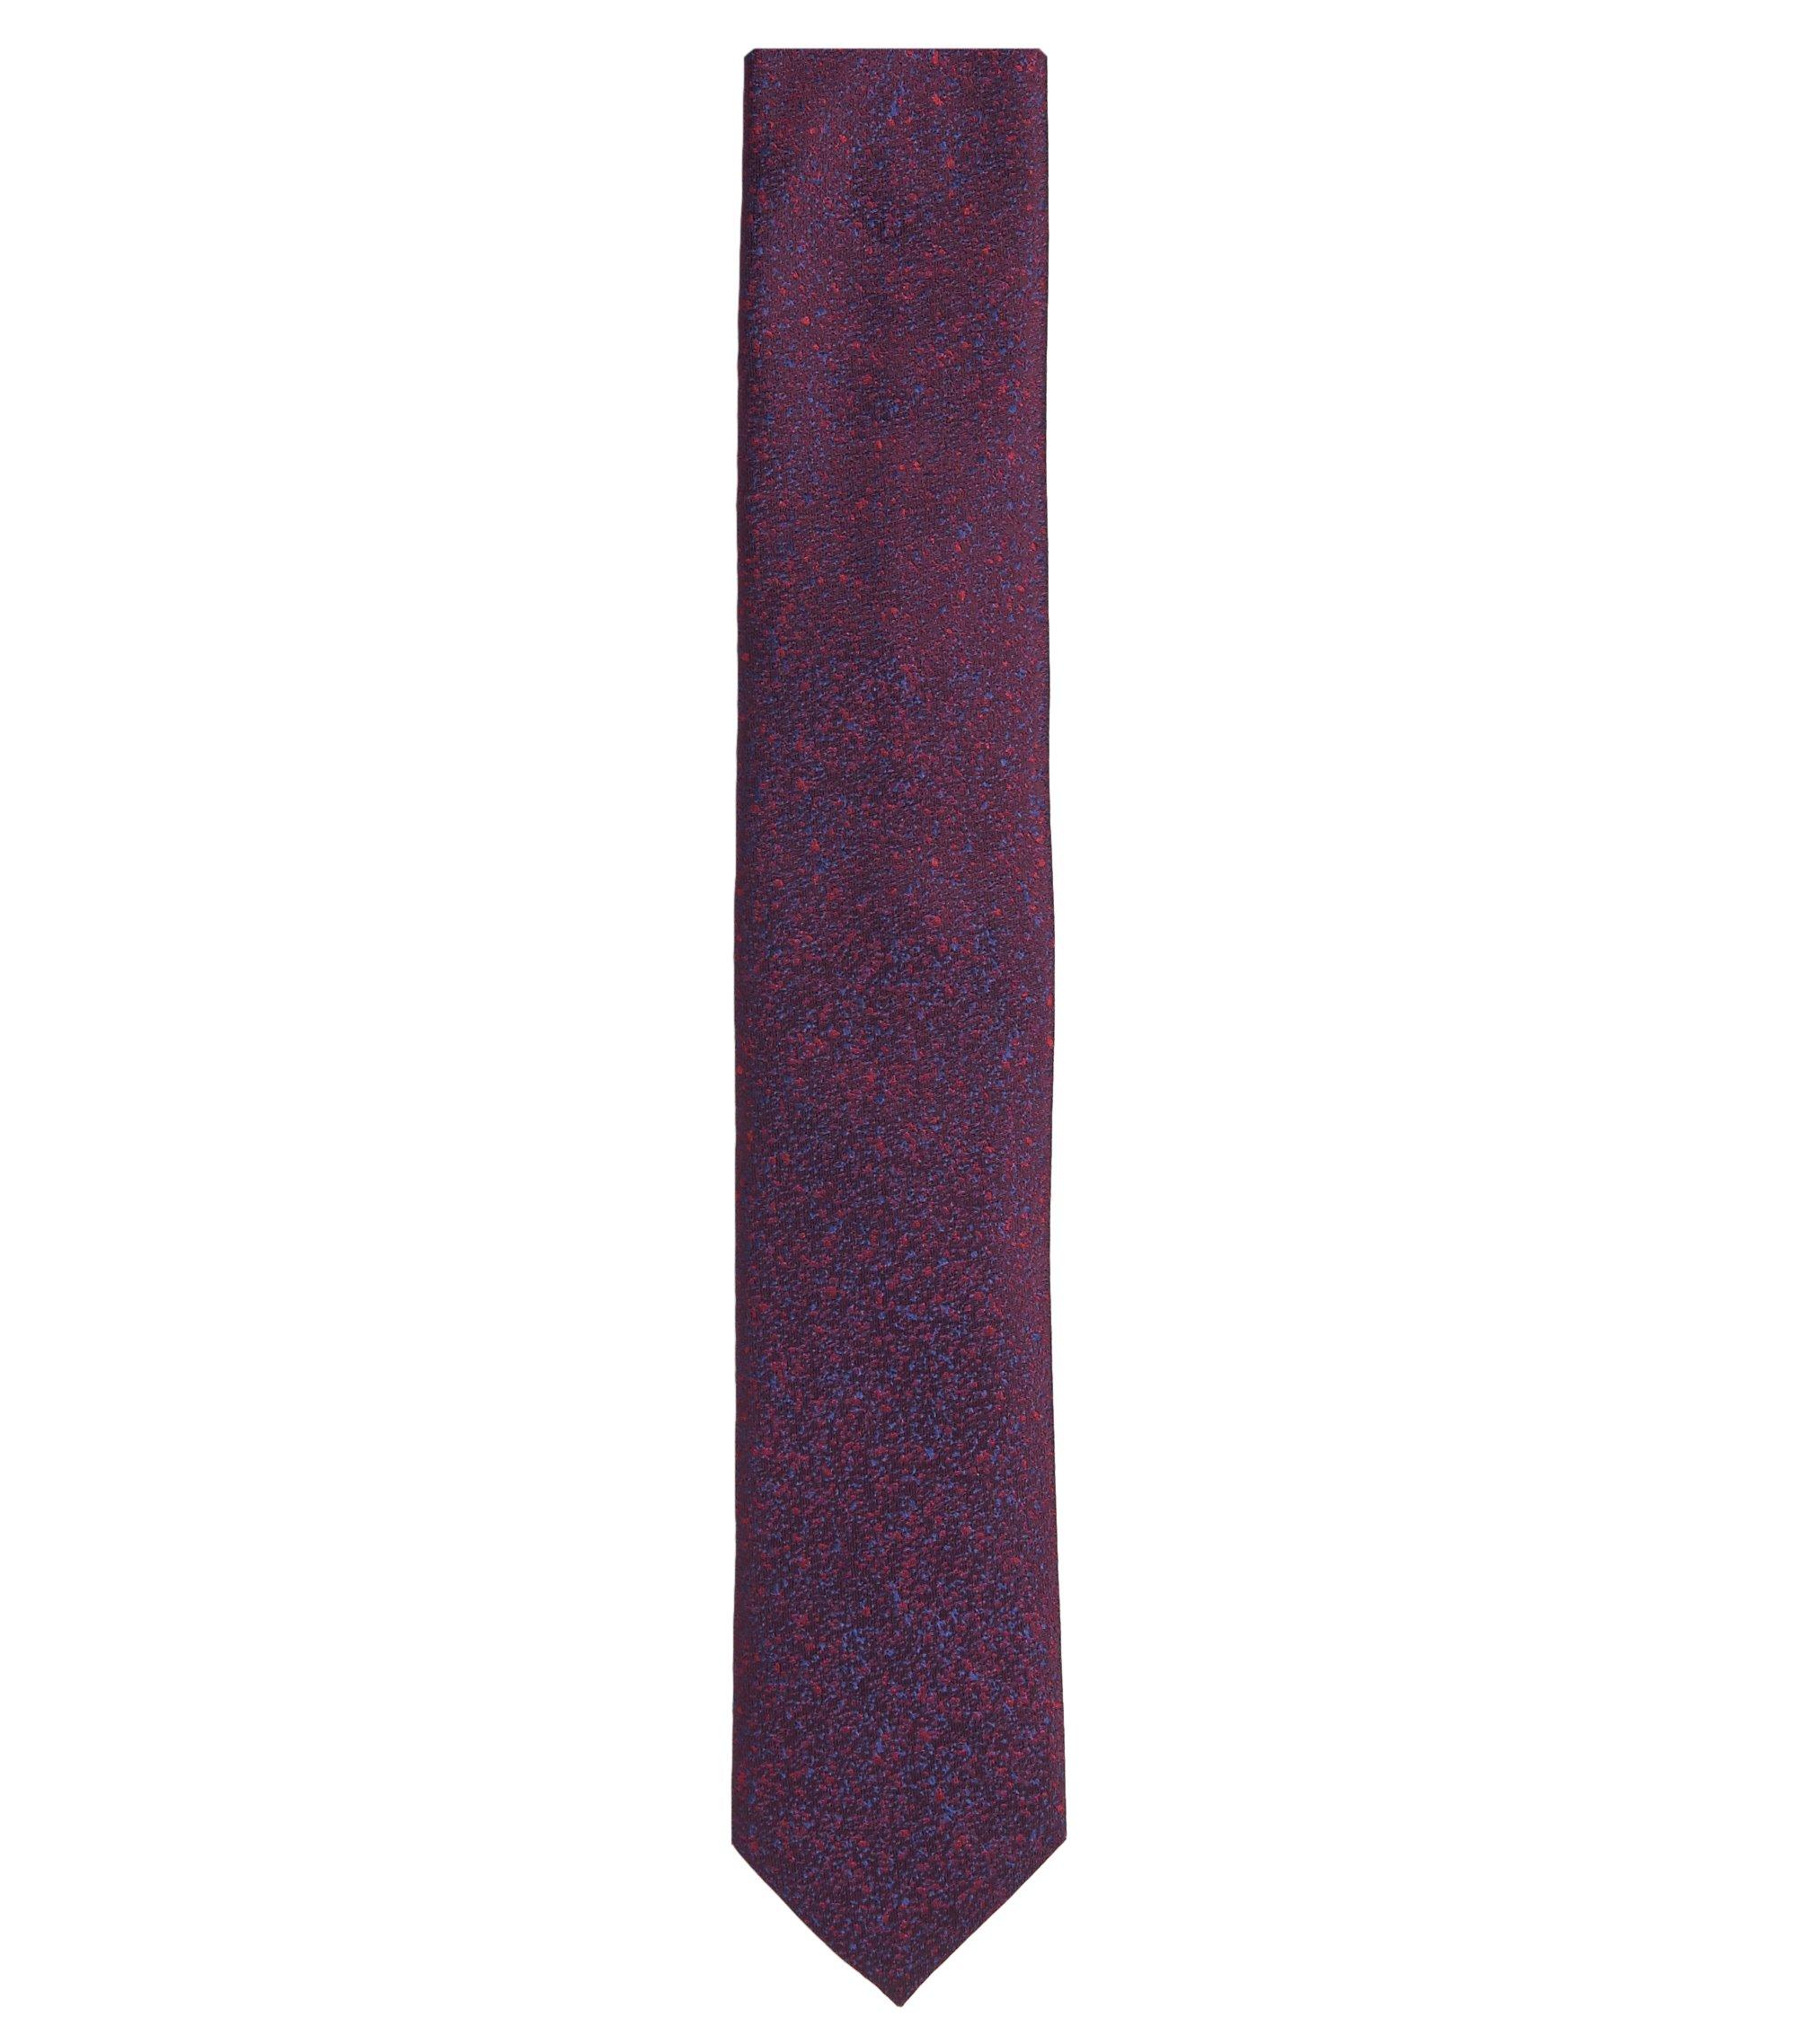 Checked Italian Silk Tie, Dark Red